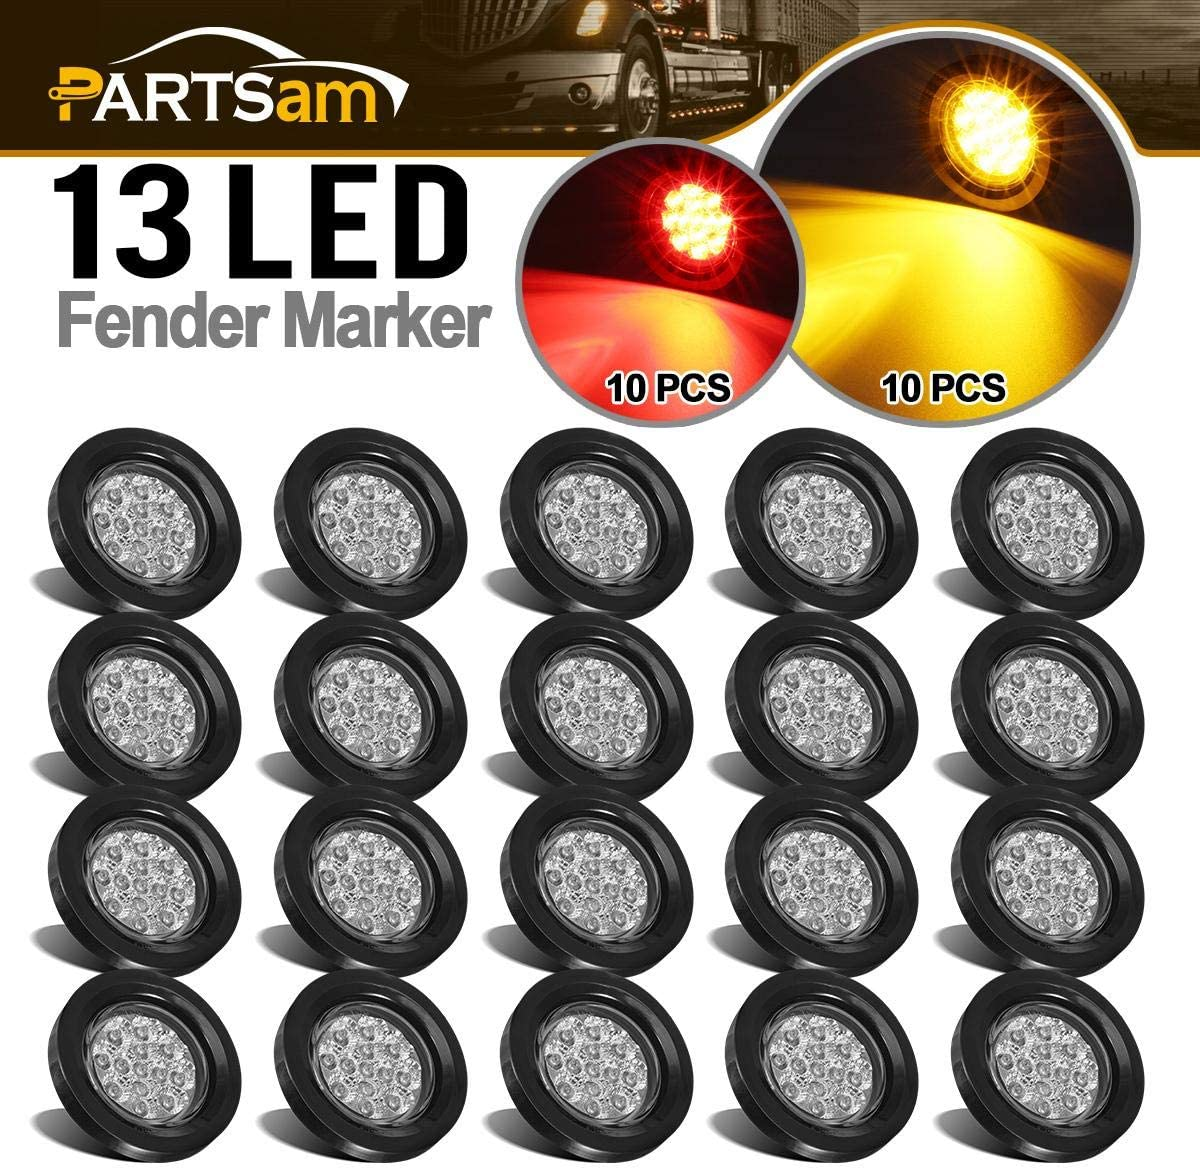 "Partsam 20Pcs 2.5"" Round Trailer Led and Side Marker Lights 13 Diodes Clear Lens w Reflectors Grommets/Pigtails Truck RV Waterproof, Led Cab Panel Lights for Breather Bar (10Amber+10Red) 71QAtNSSZaLSL1200_"